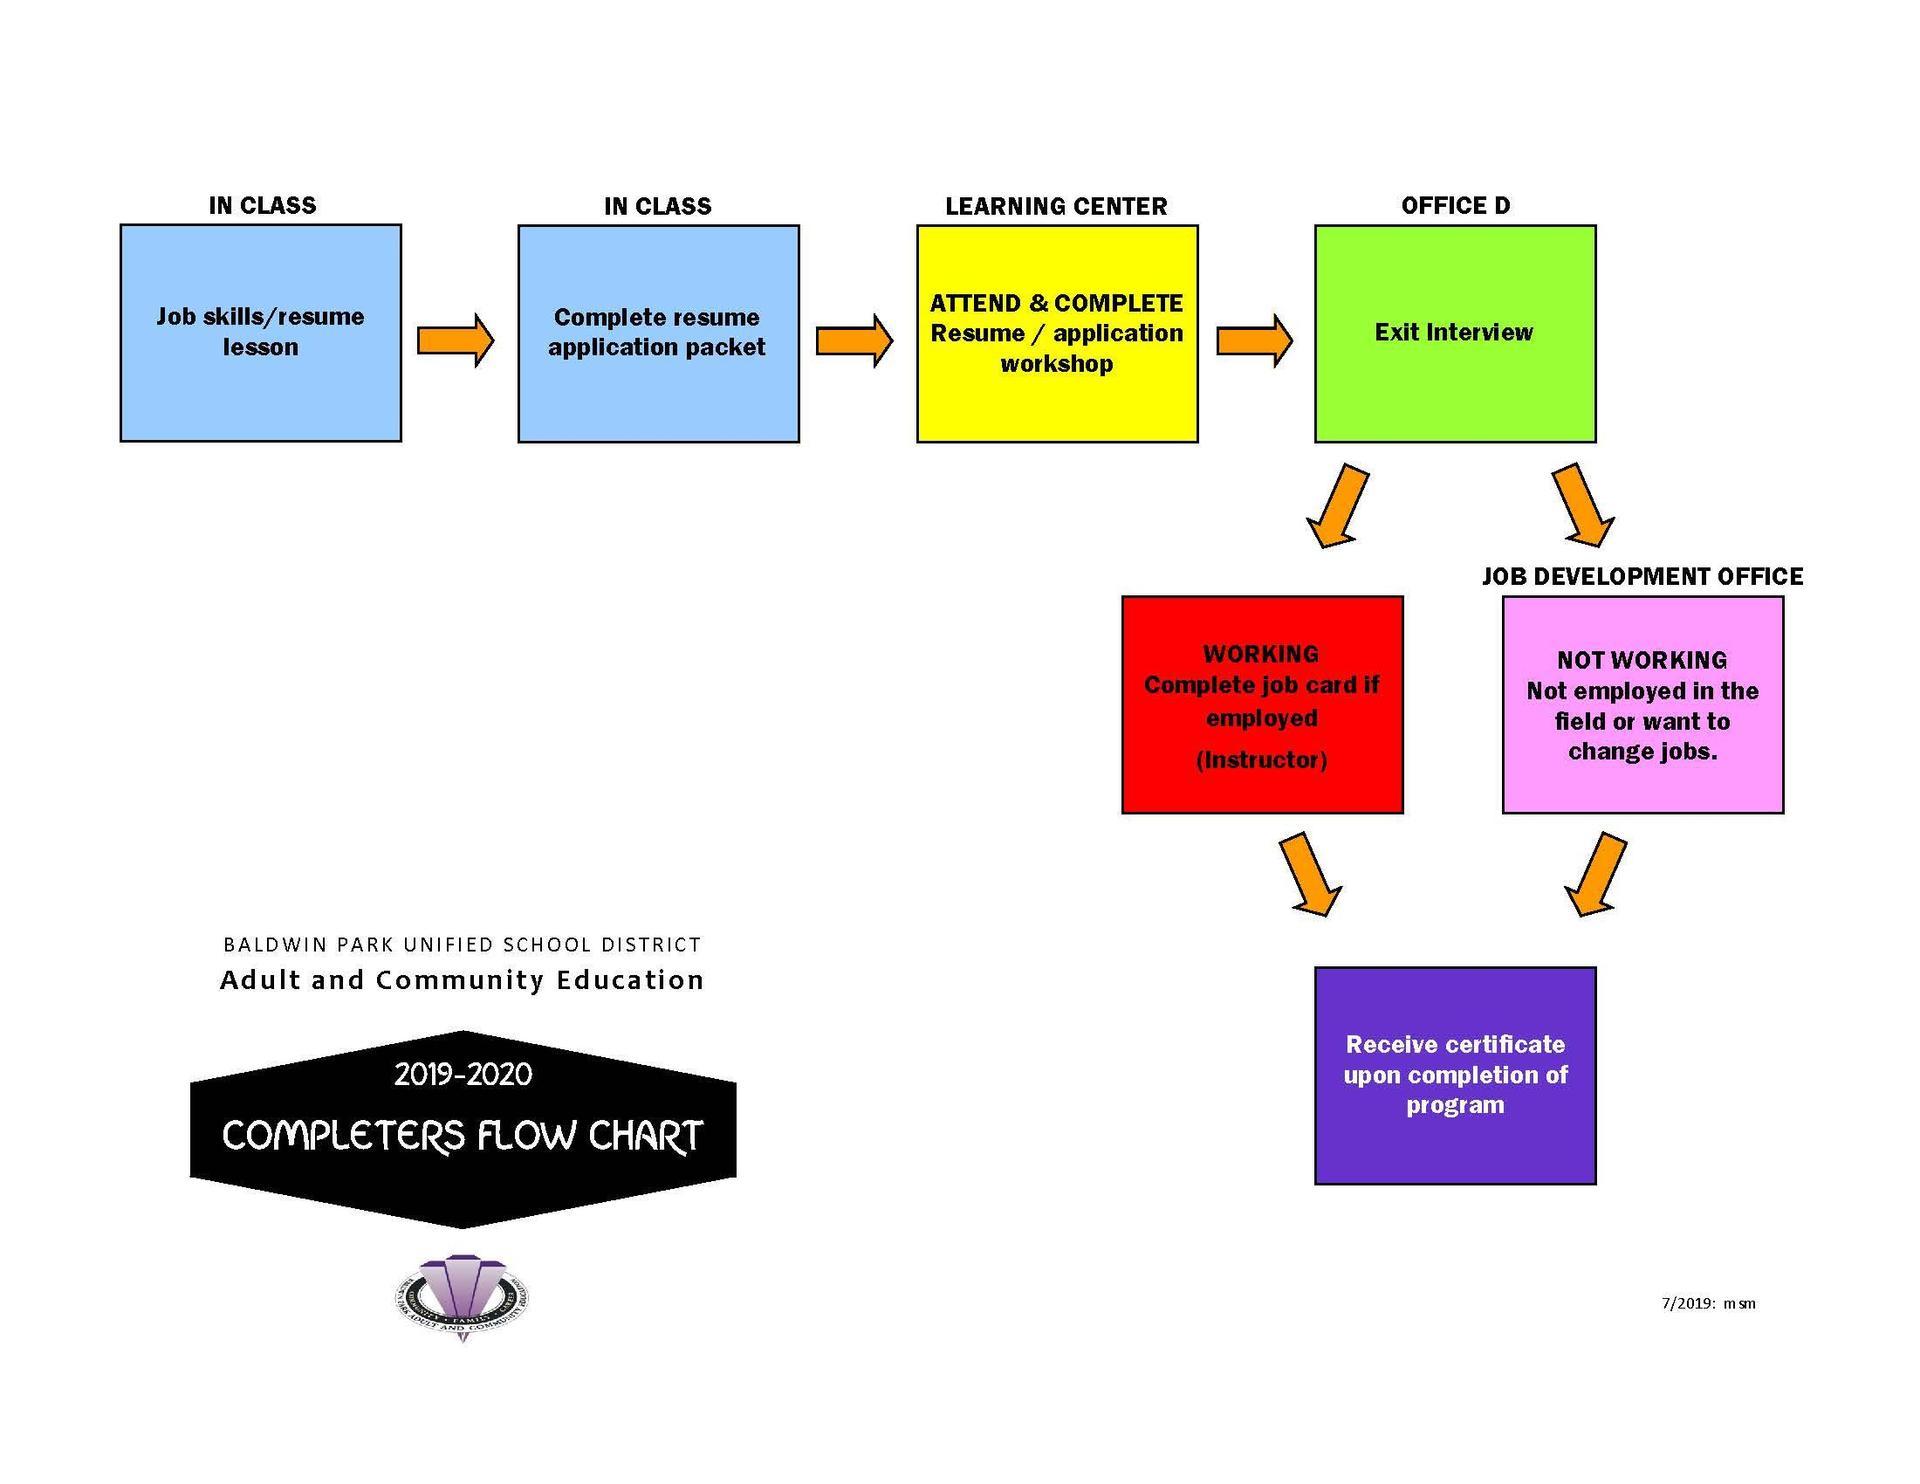 Completer's Flow Chart